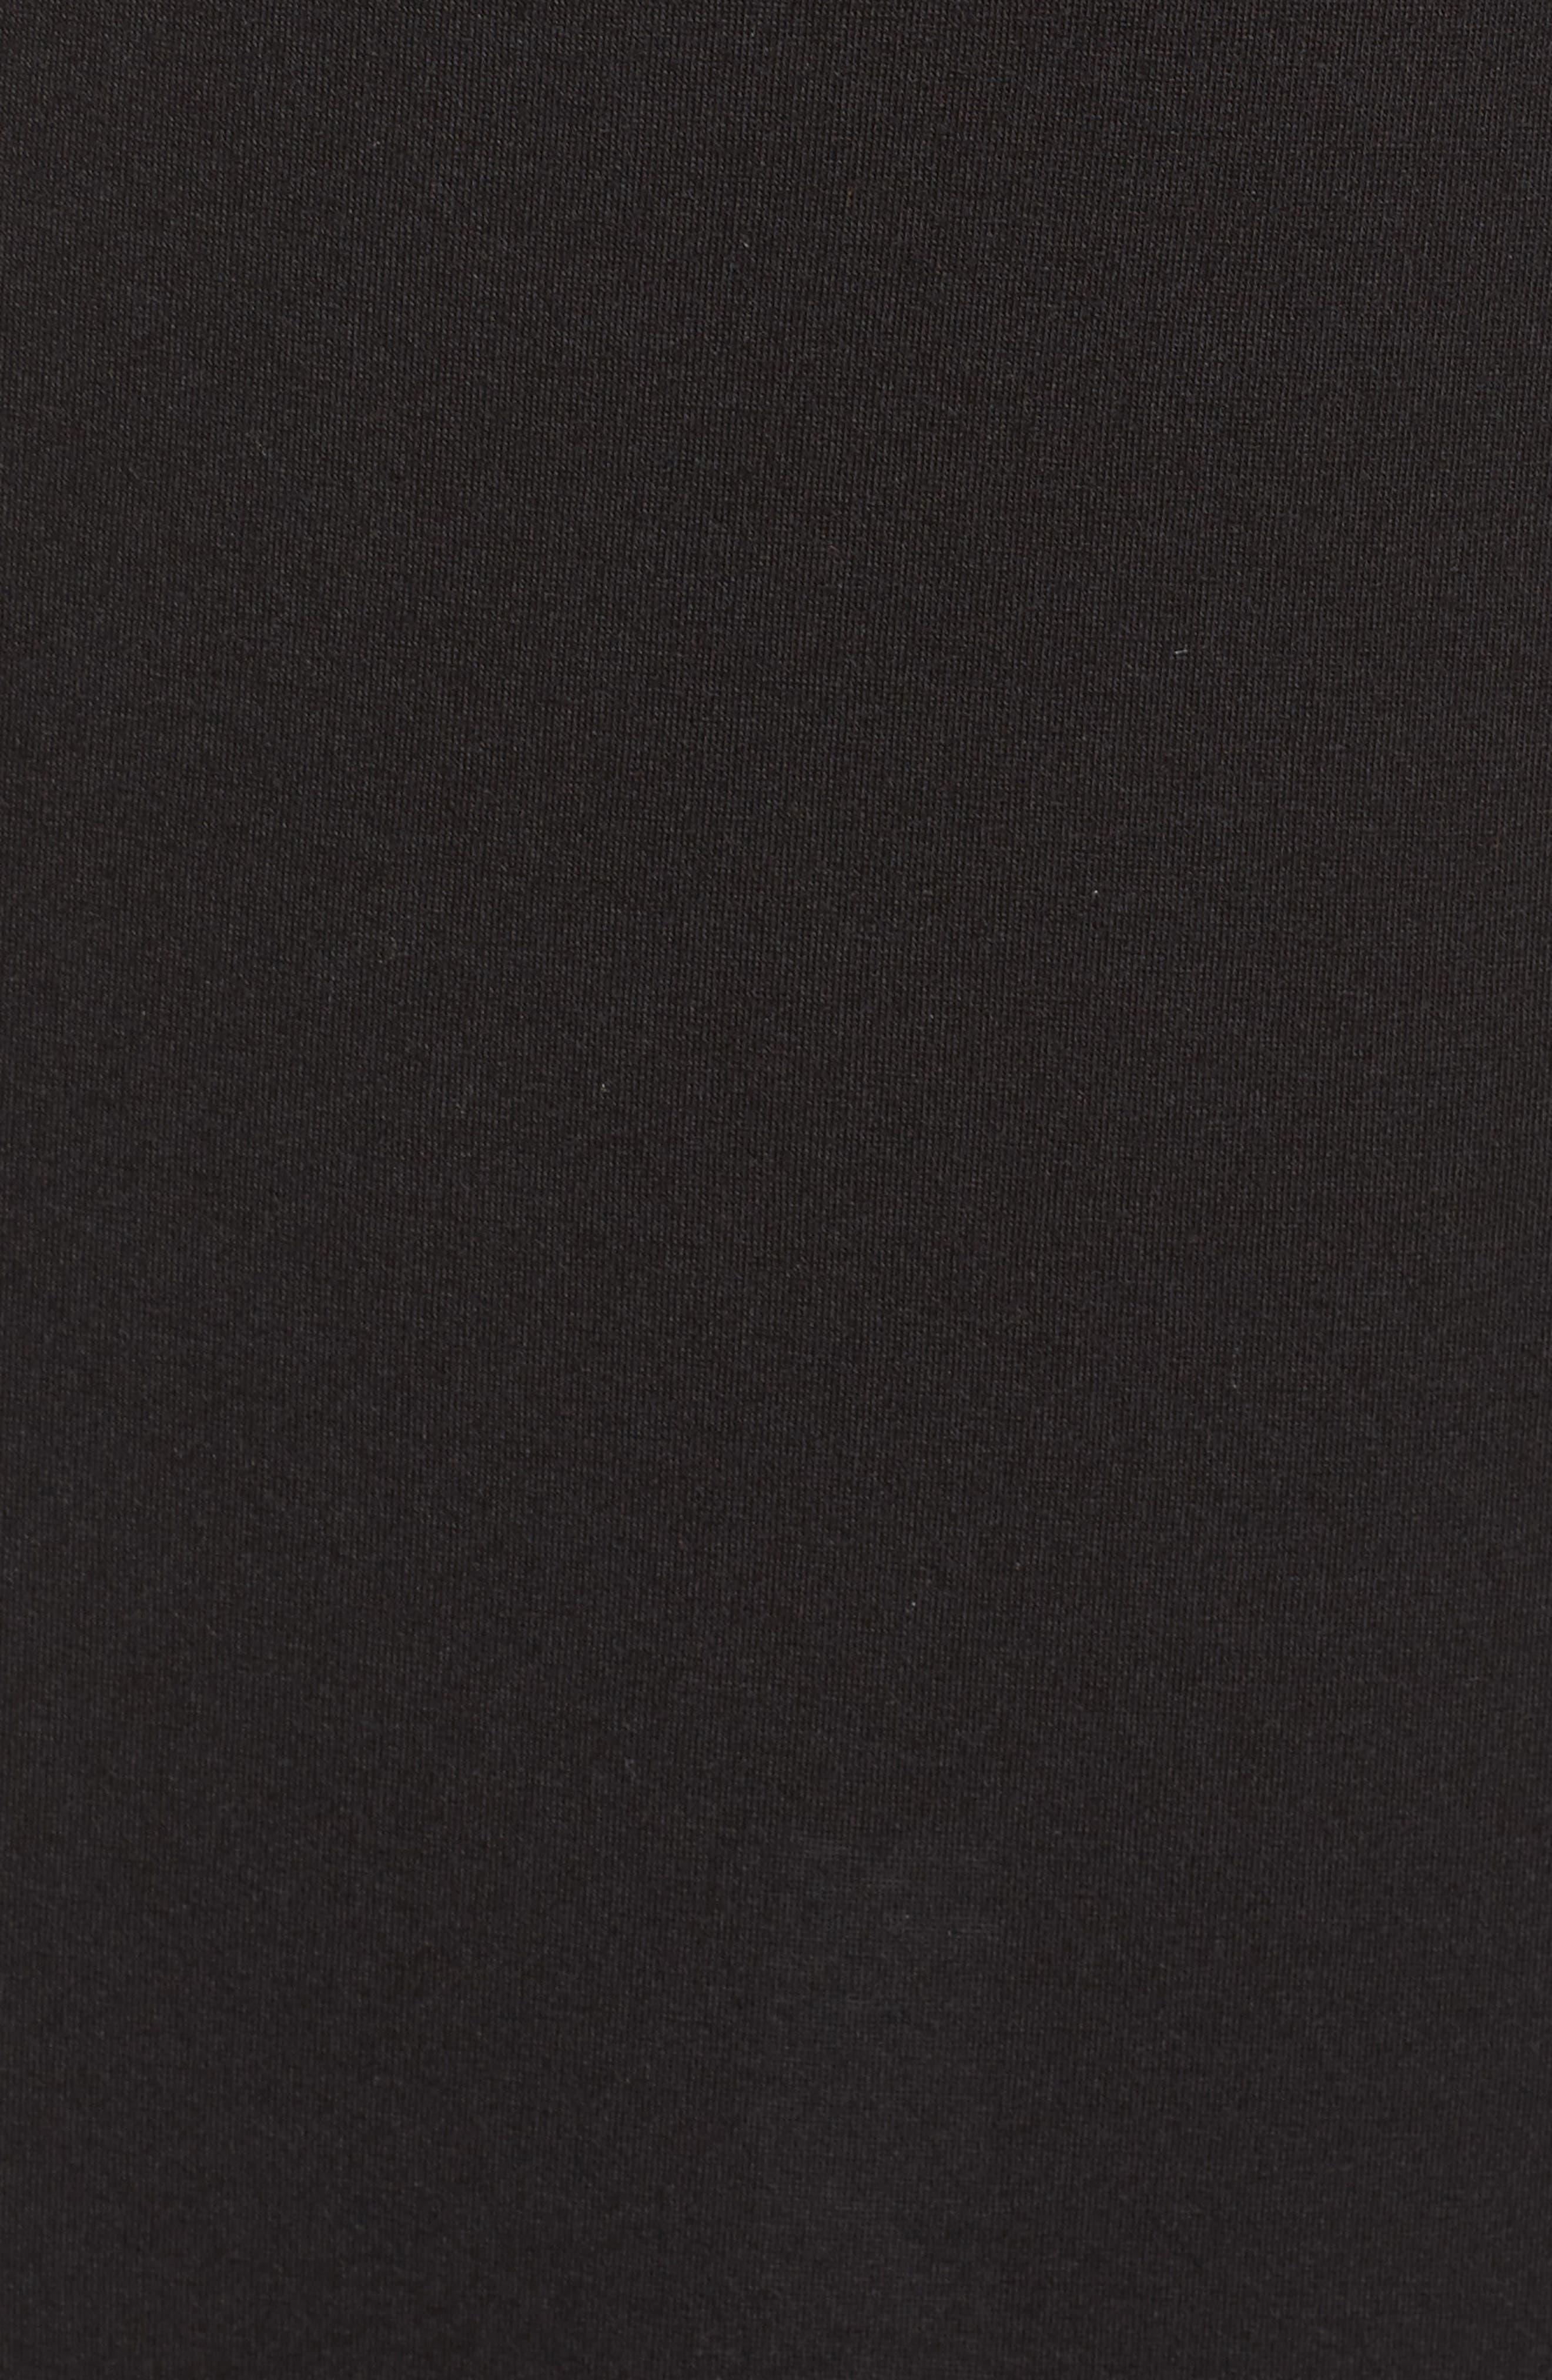 Shangri La Nightgown,                             Alternate thumbnail 6, color,                             BLACK